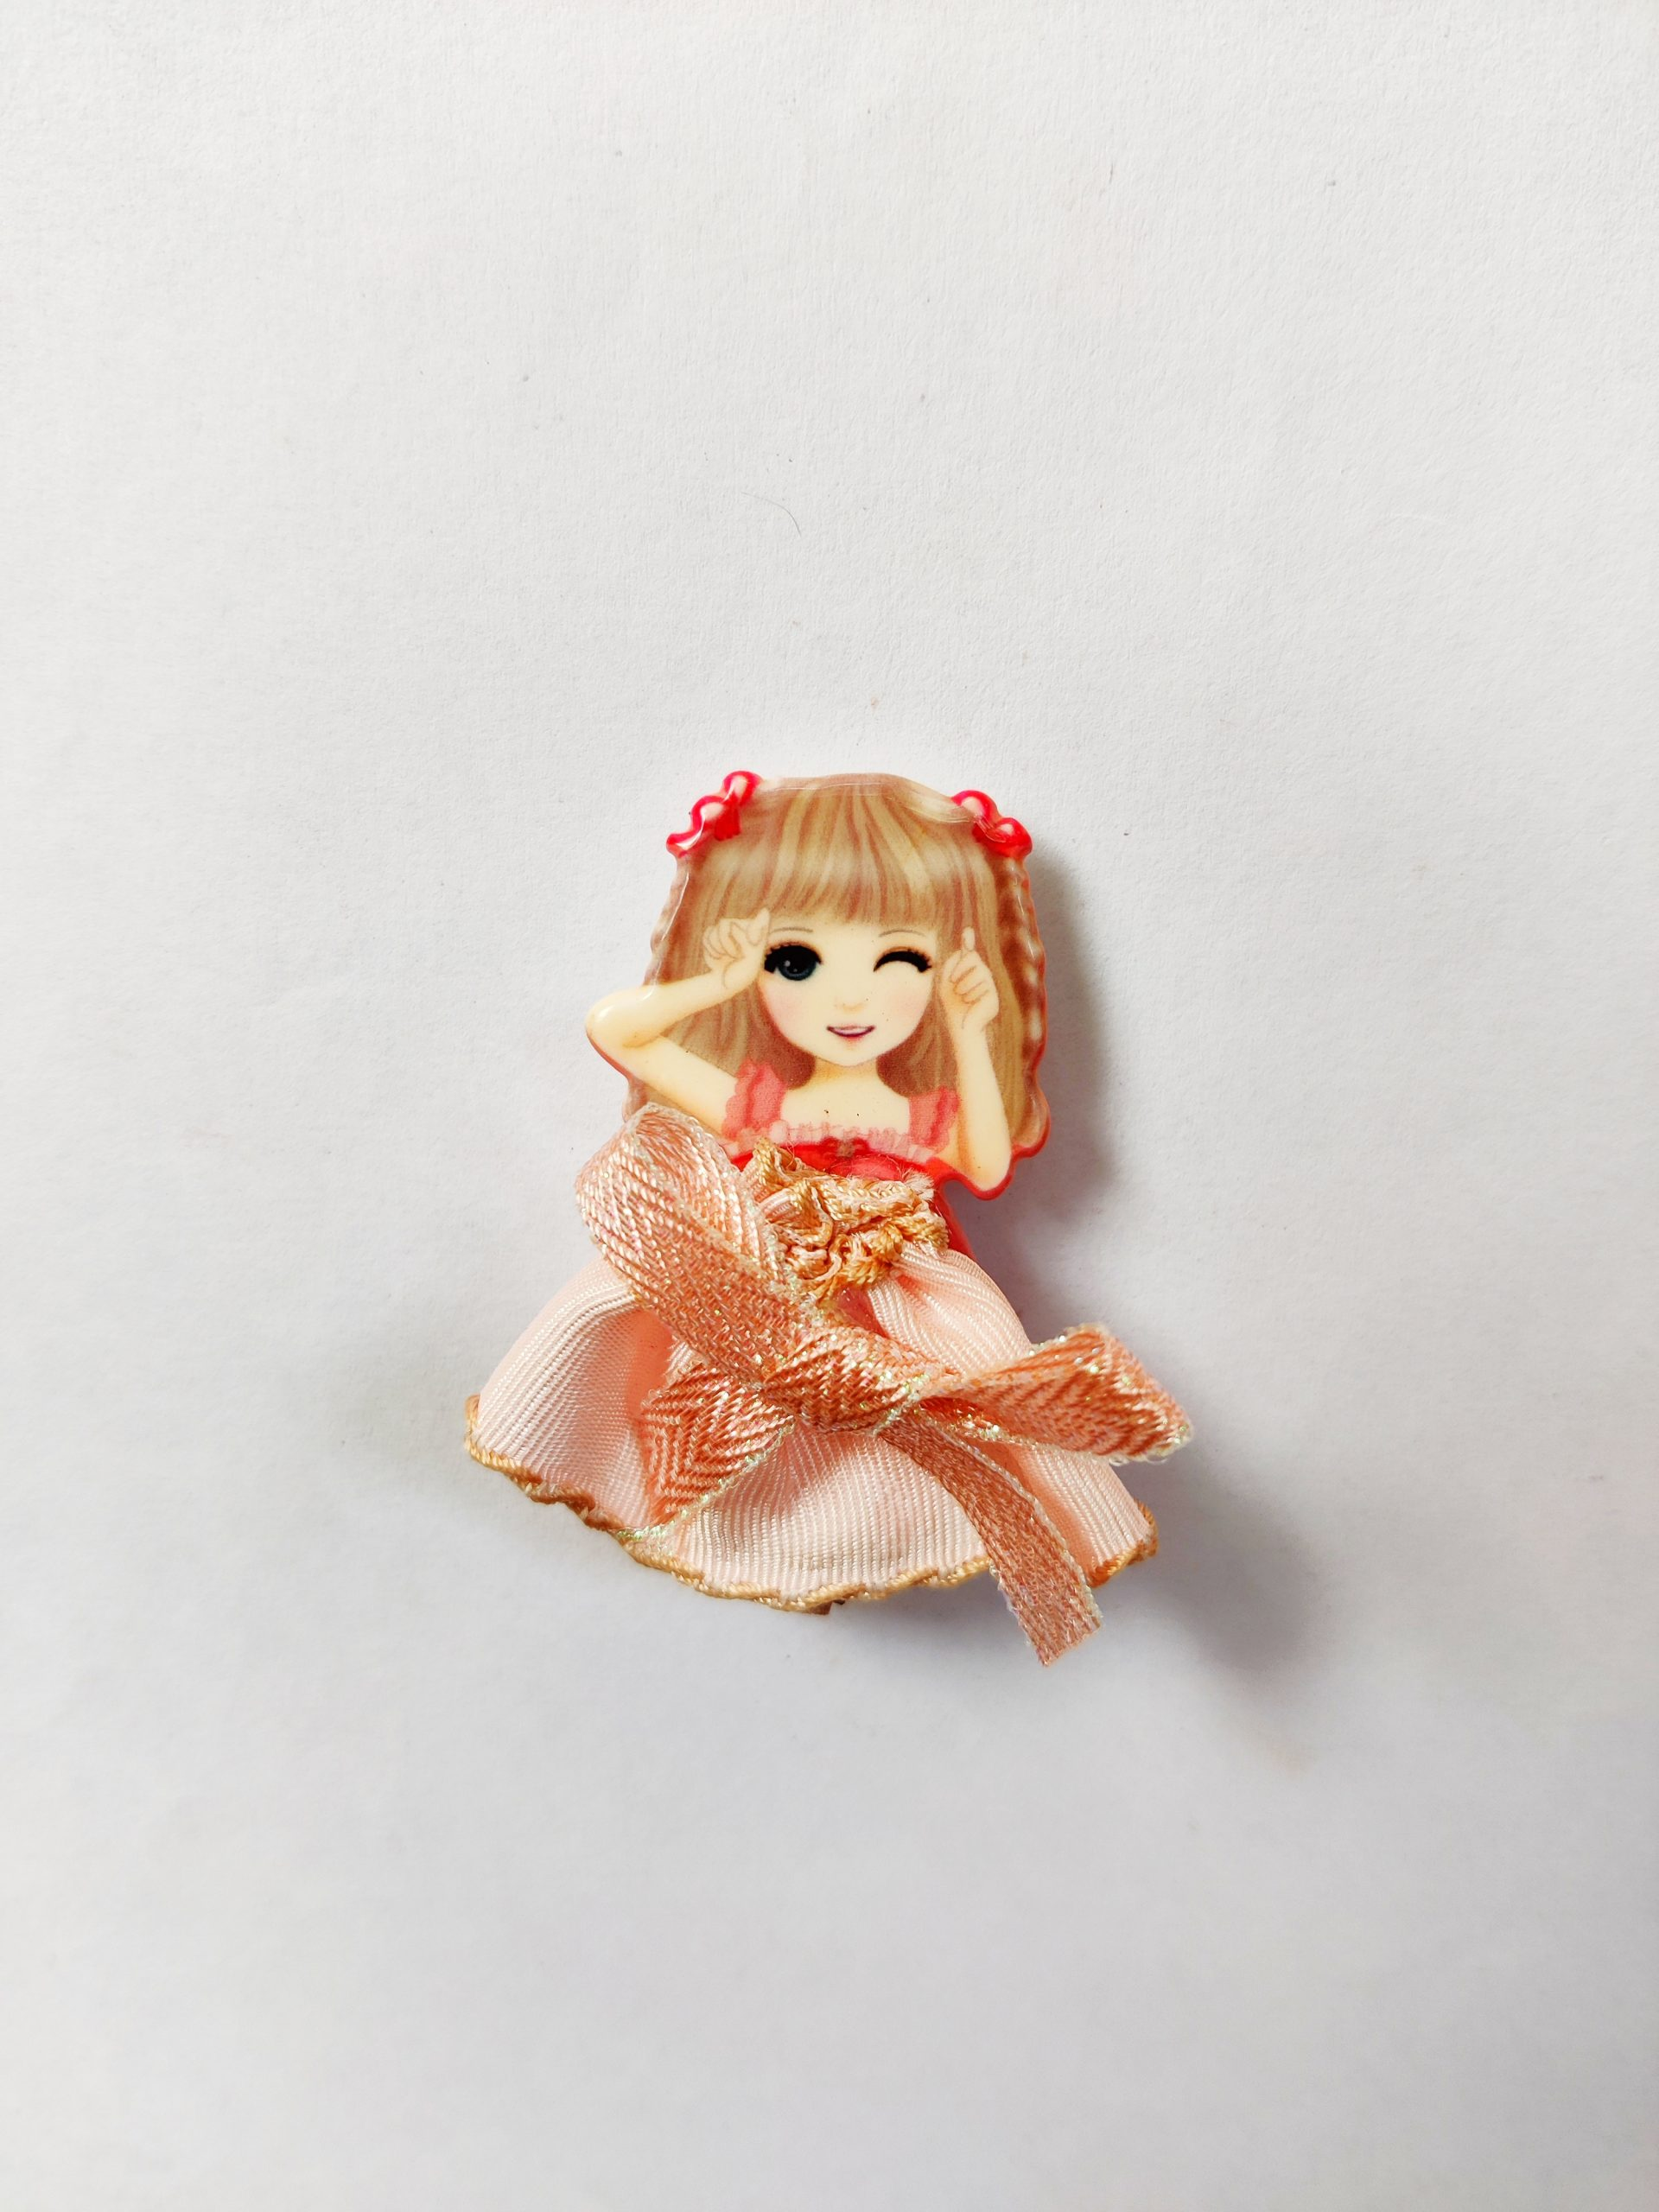 A Barbie doll